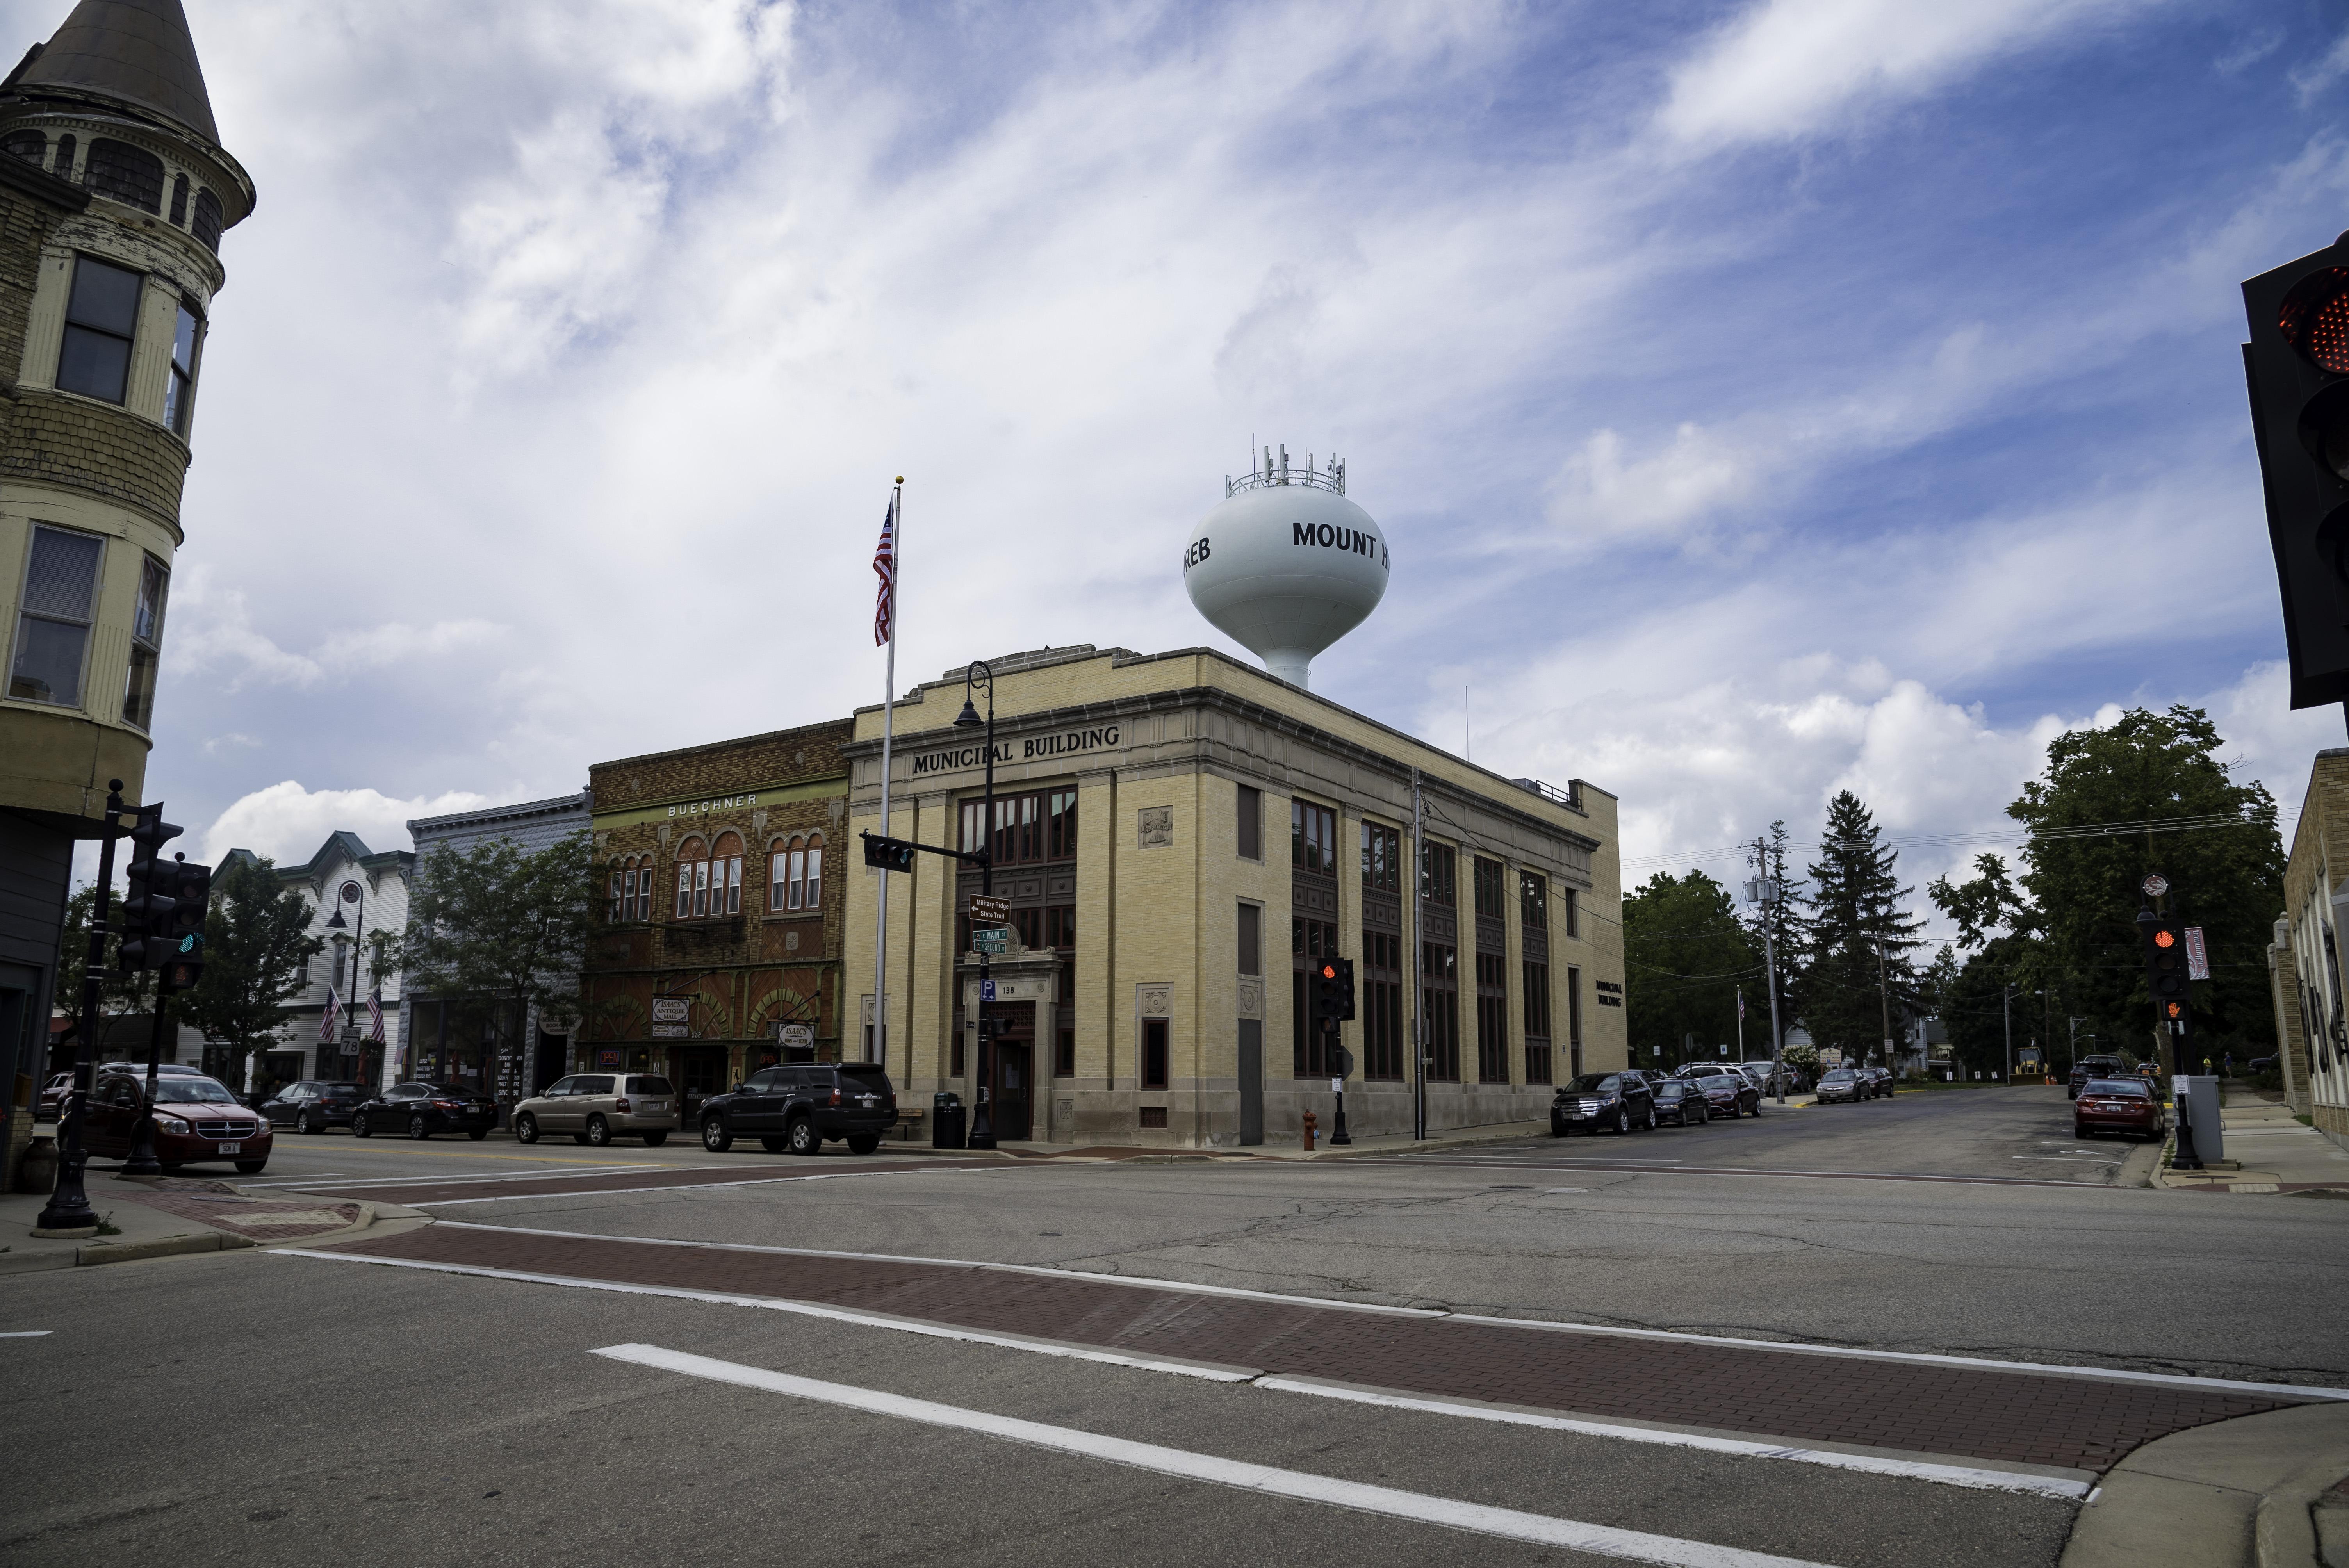 Street Corner in Mount Horeb, Wisconsin with Water Tower image